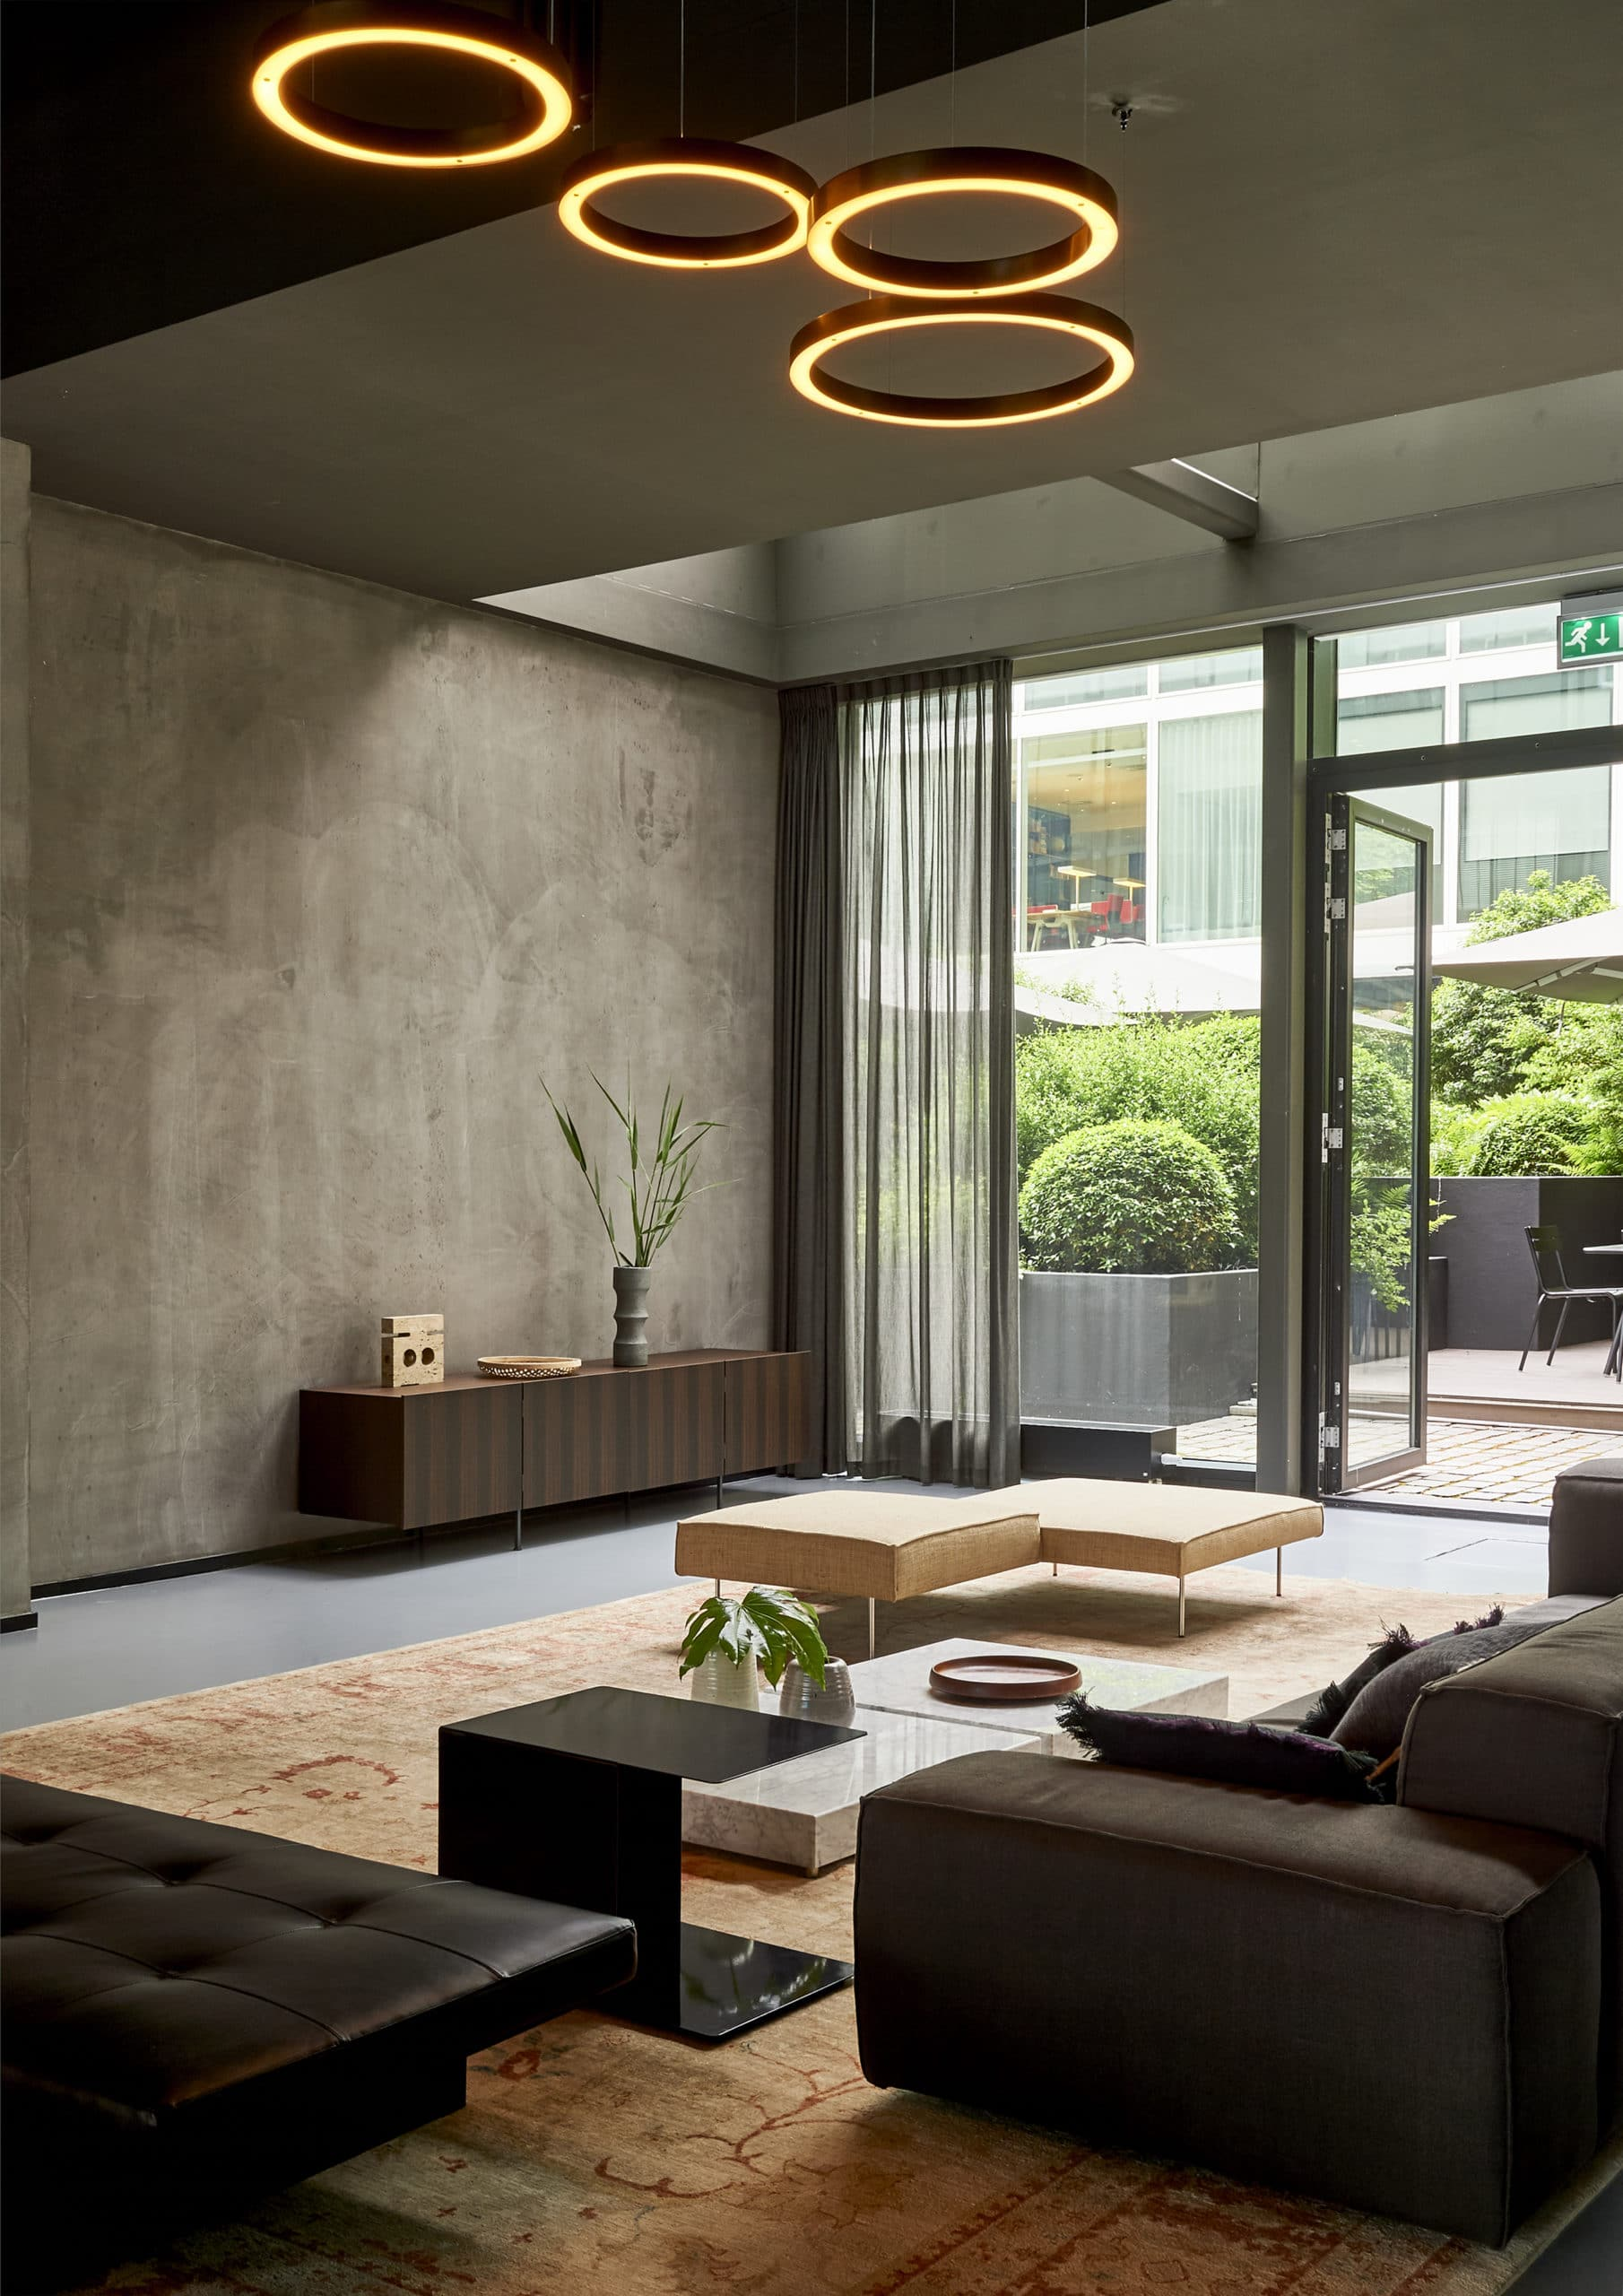 Interior shot Blakes Lounge Interior design project Dis Studio